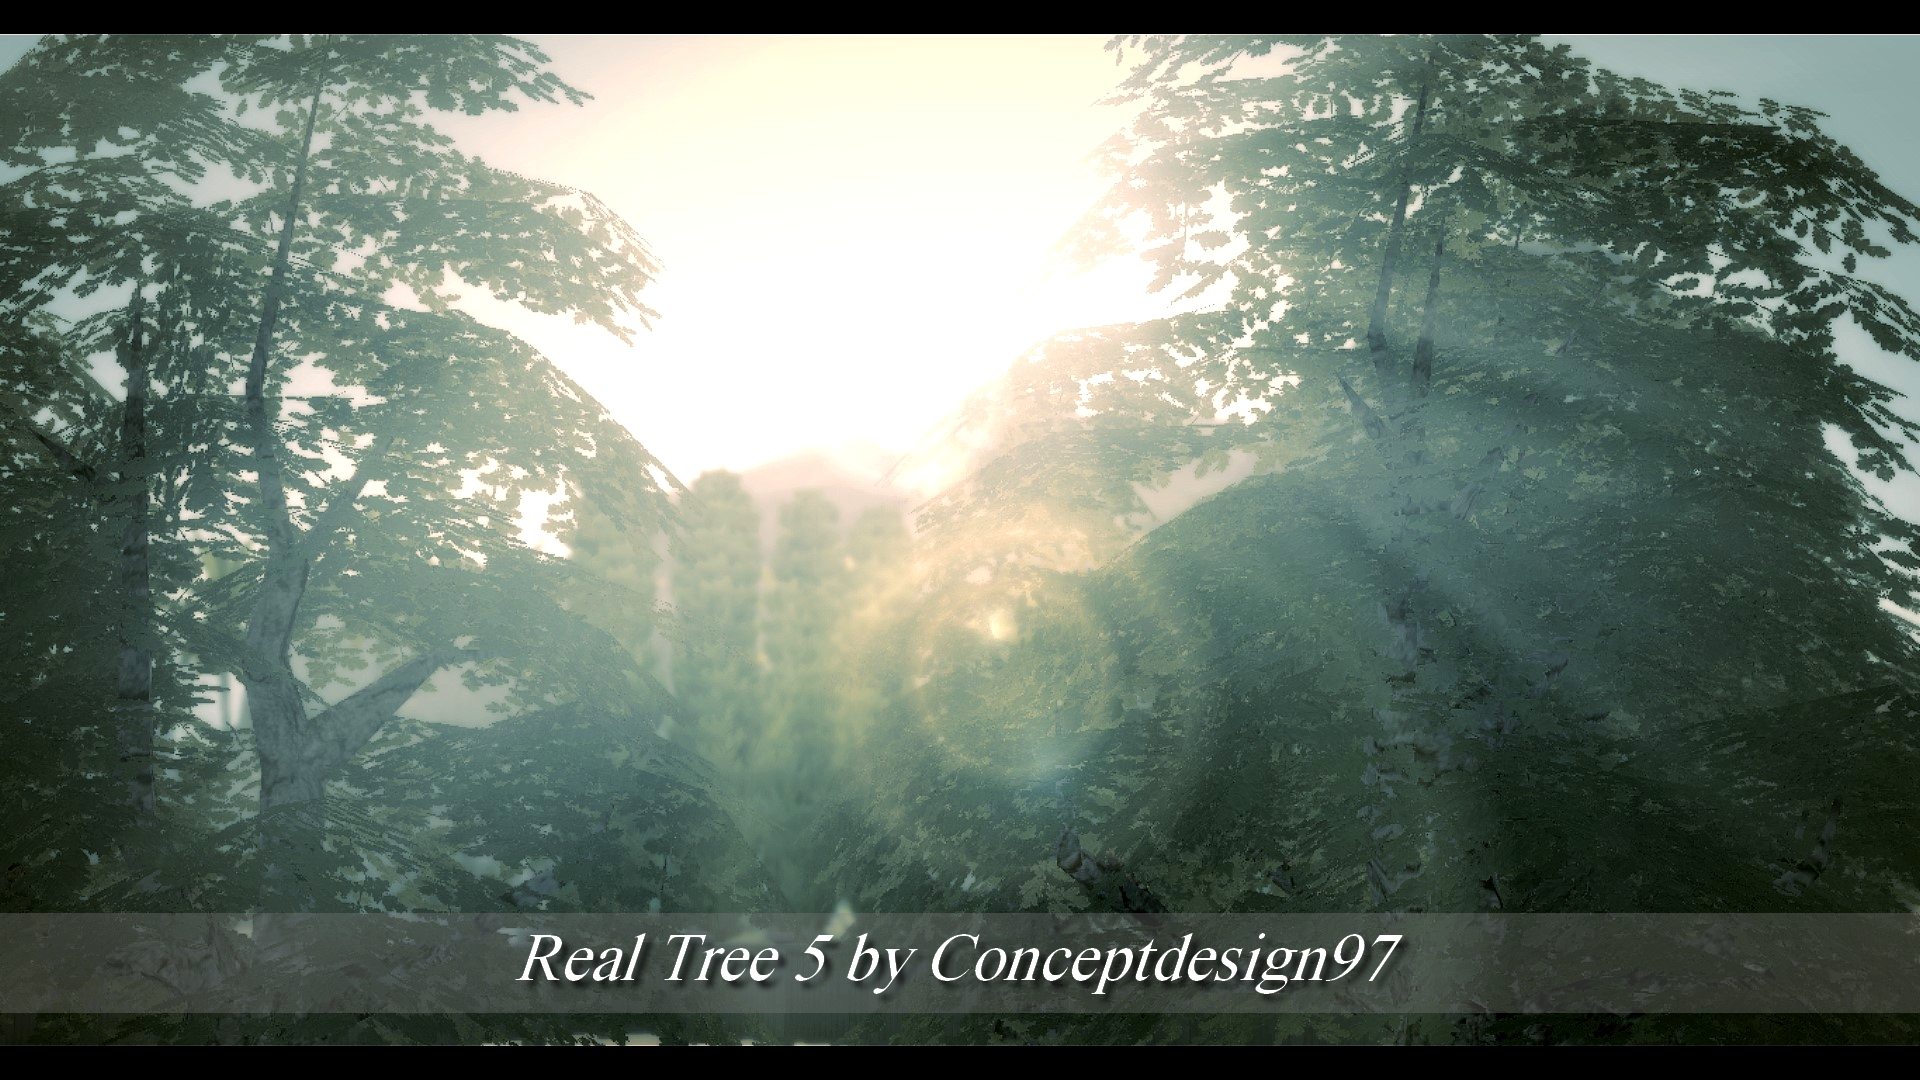 Real Tree 5.jpg